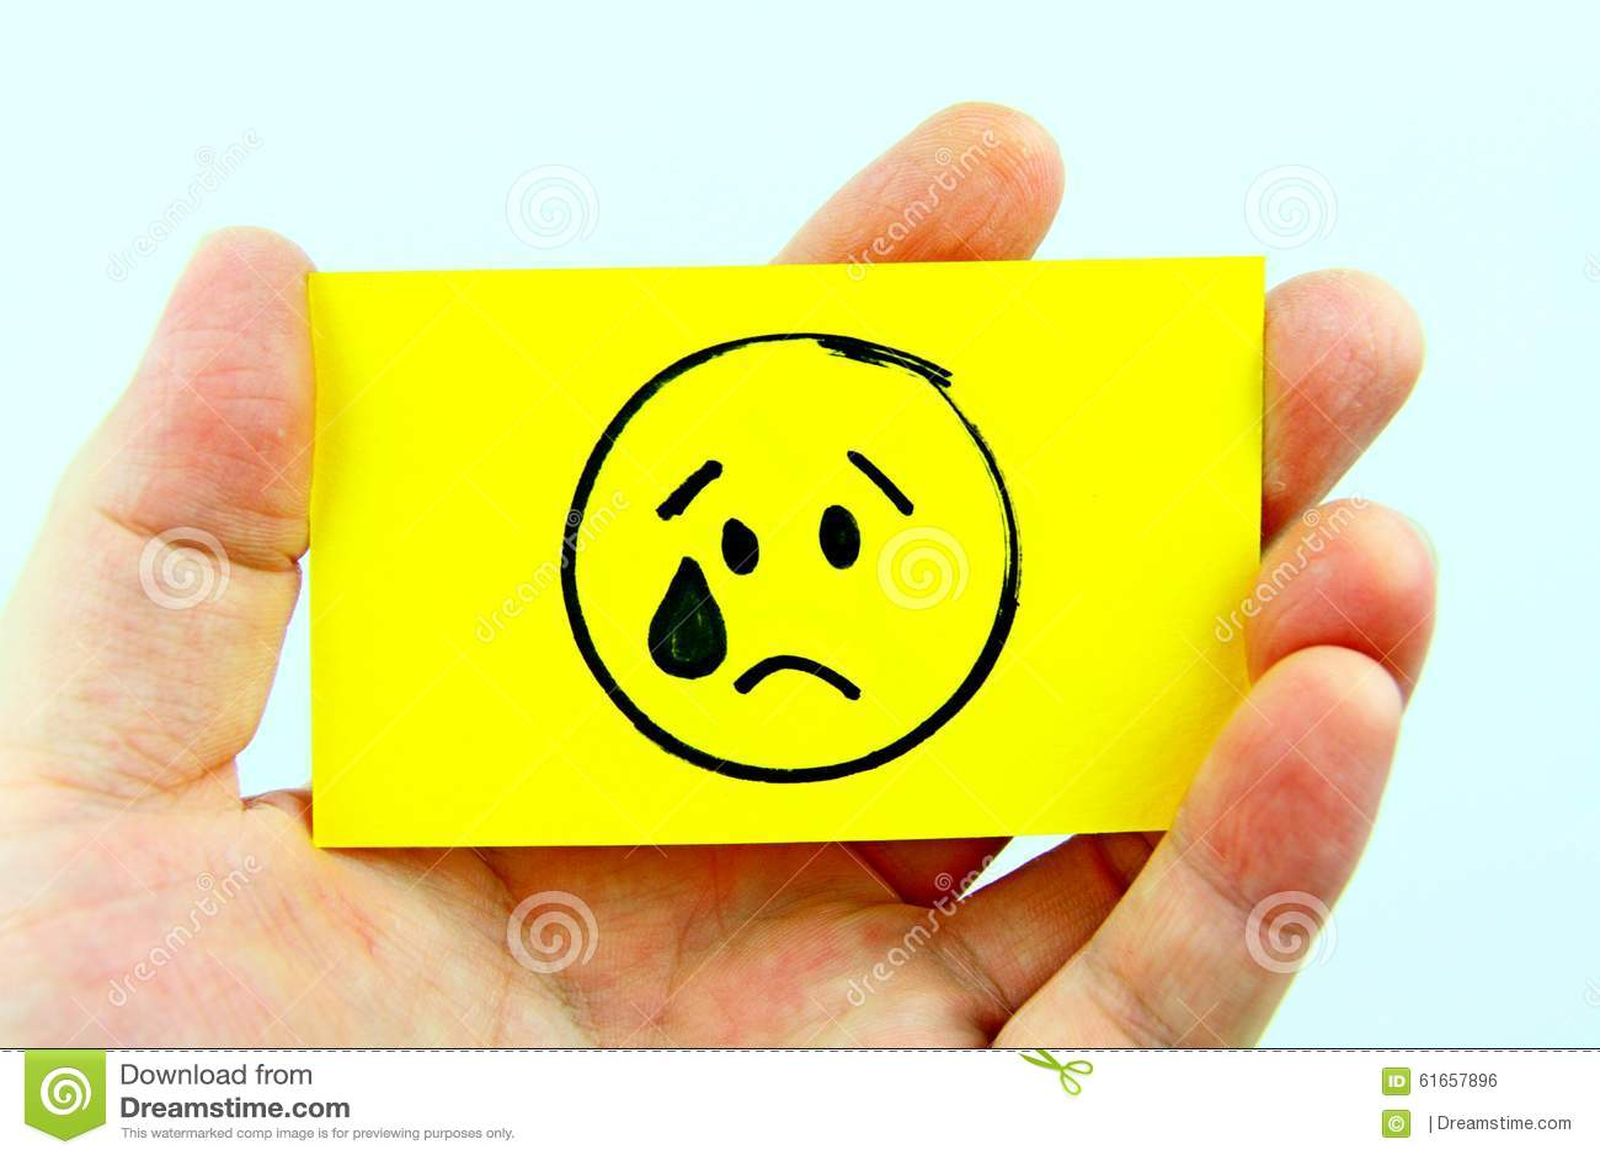 emoji de dessin de main avec le visage d moticne retrait frais - Dessin Avec Emoji